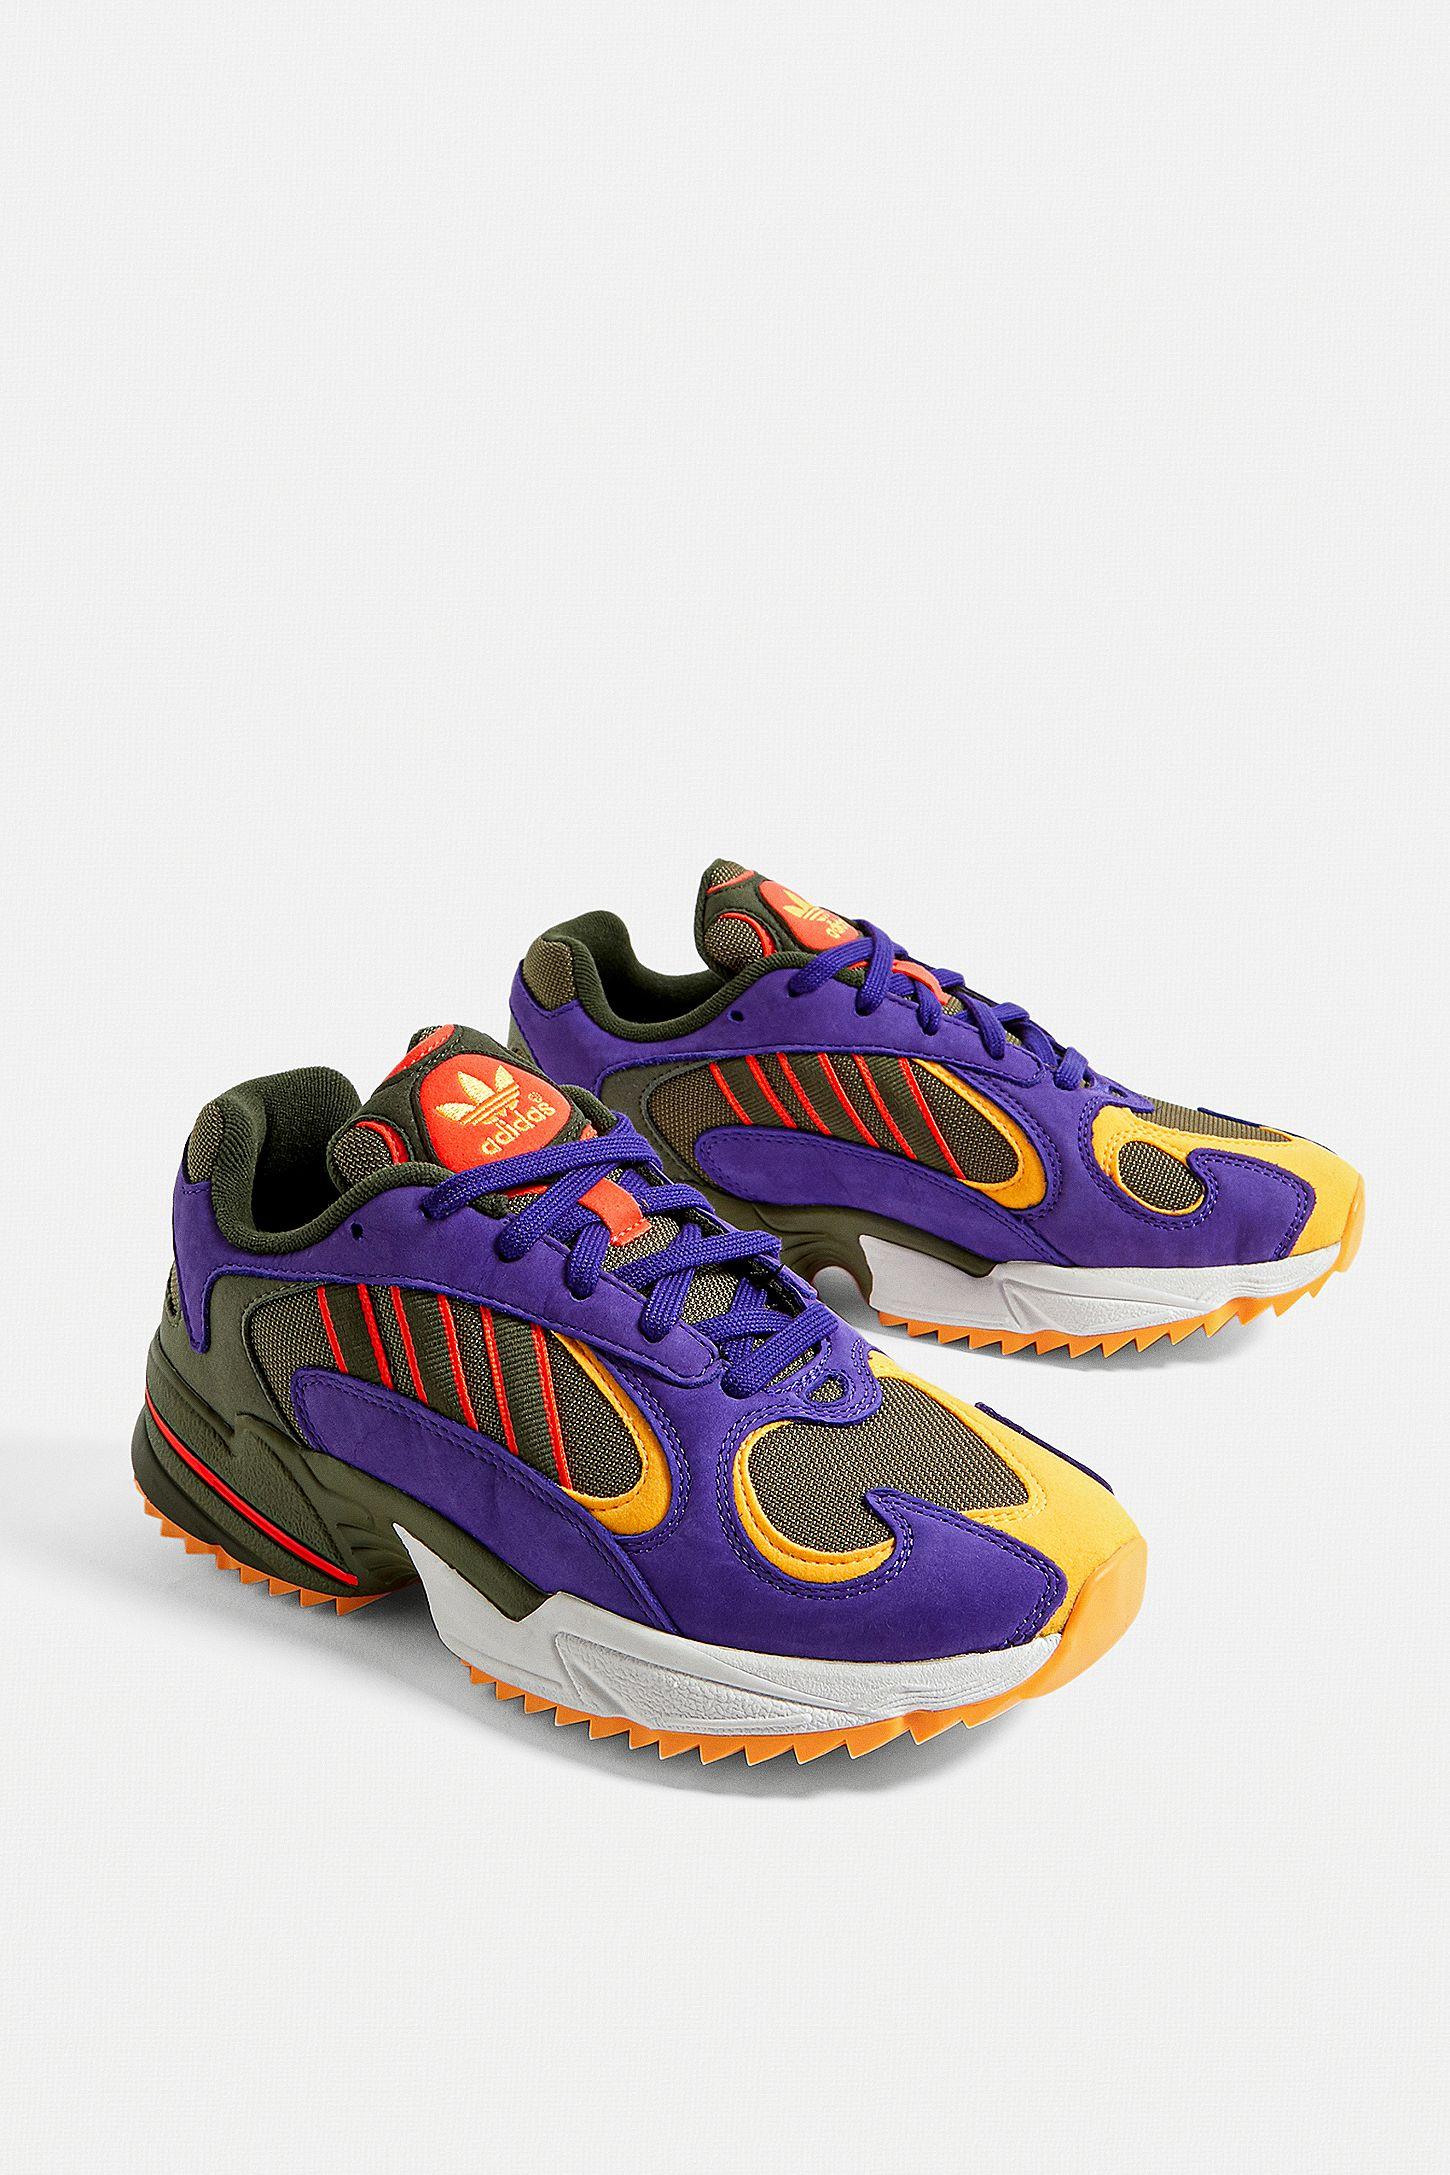 adidas Originals – Yung 1 Trail Sneaker in Khaki